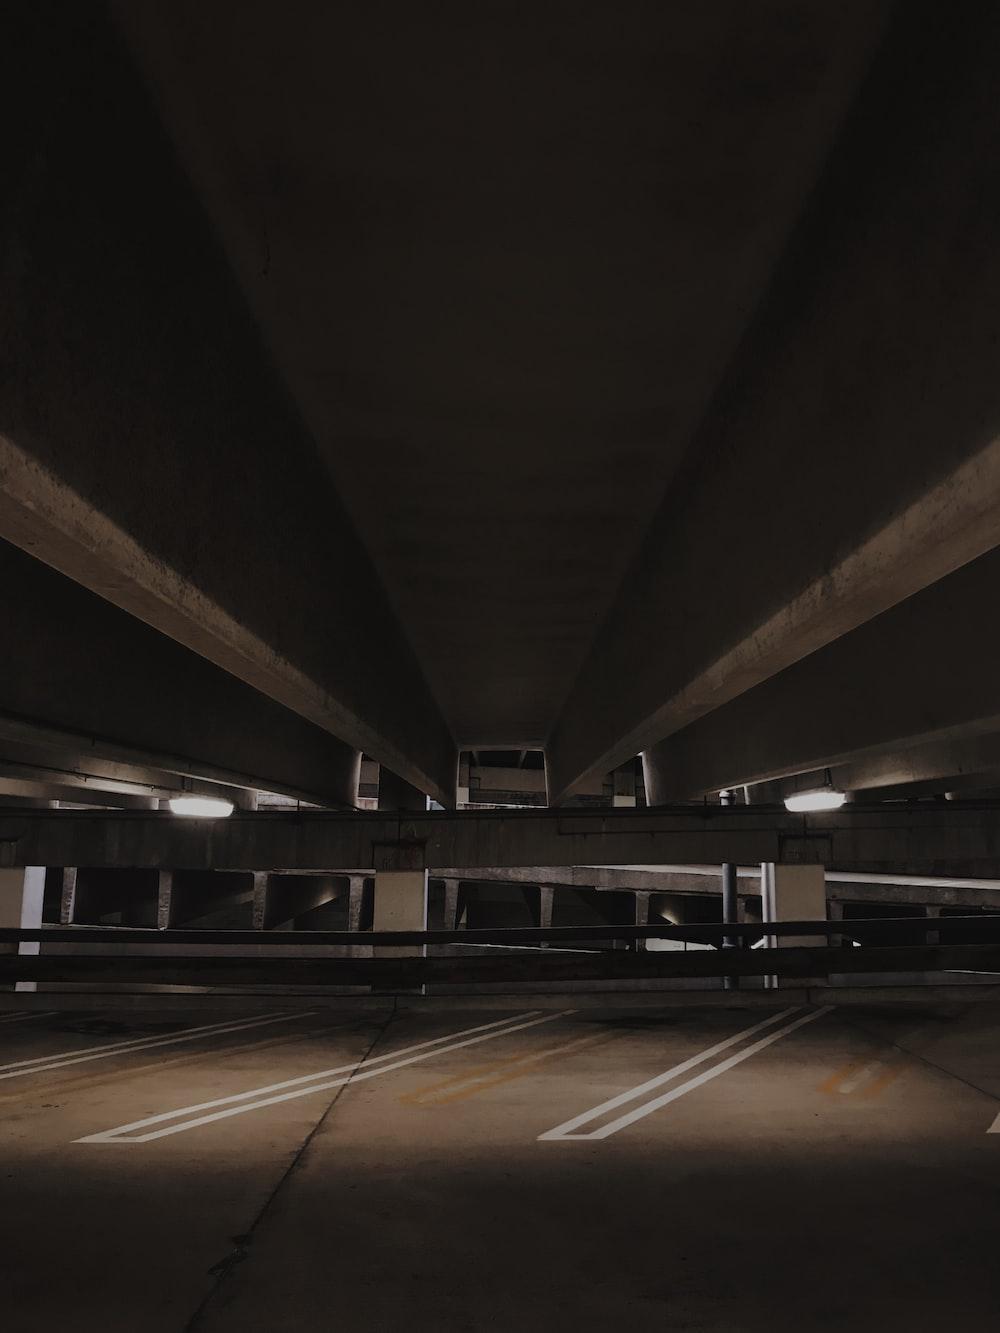 underground vehicle parking lot